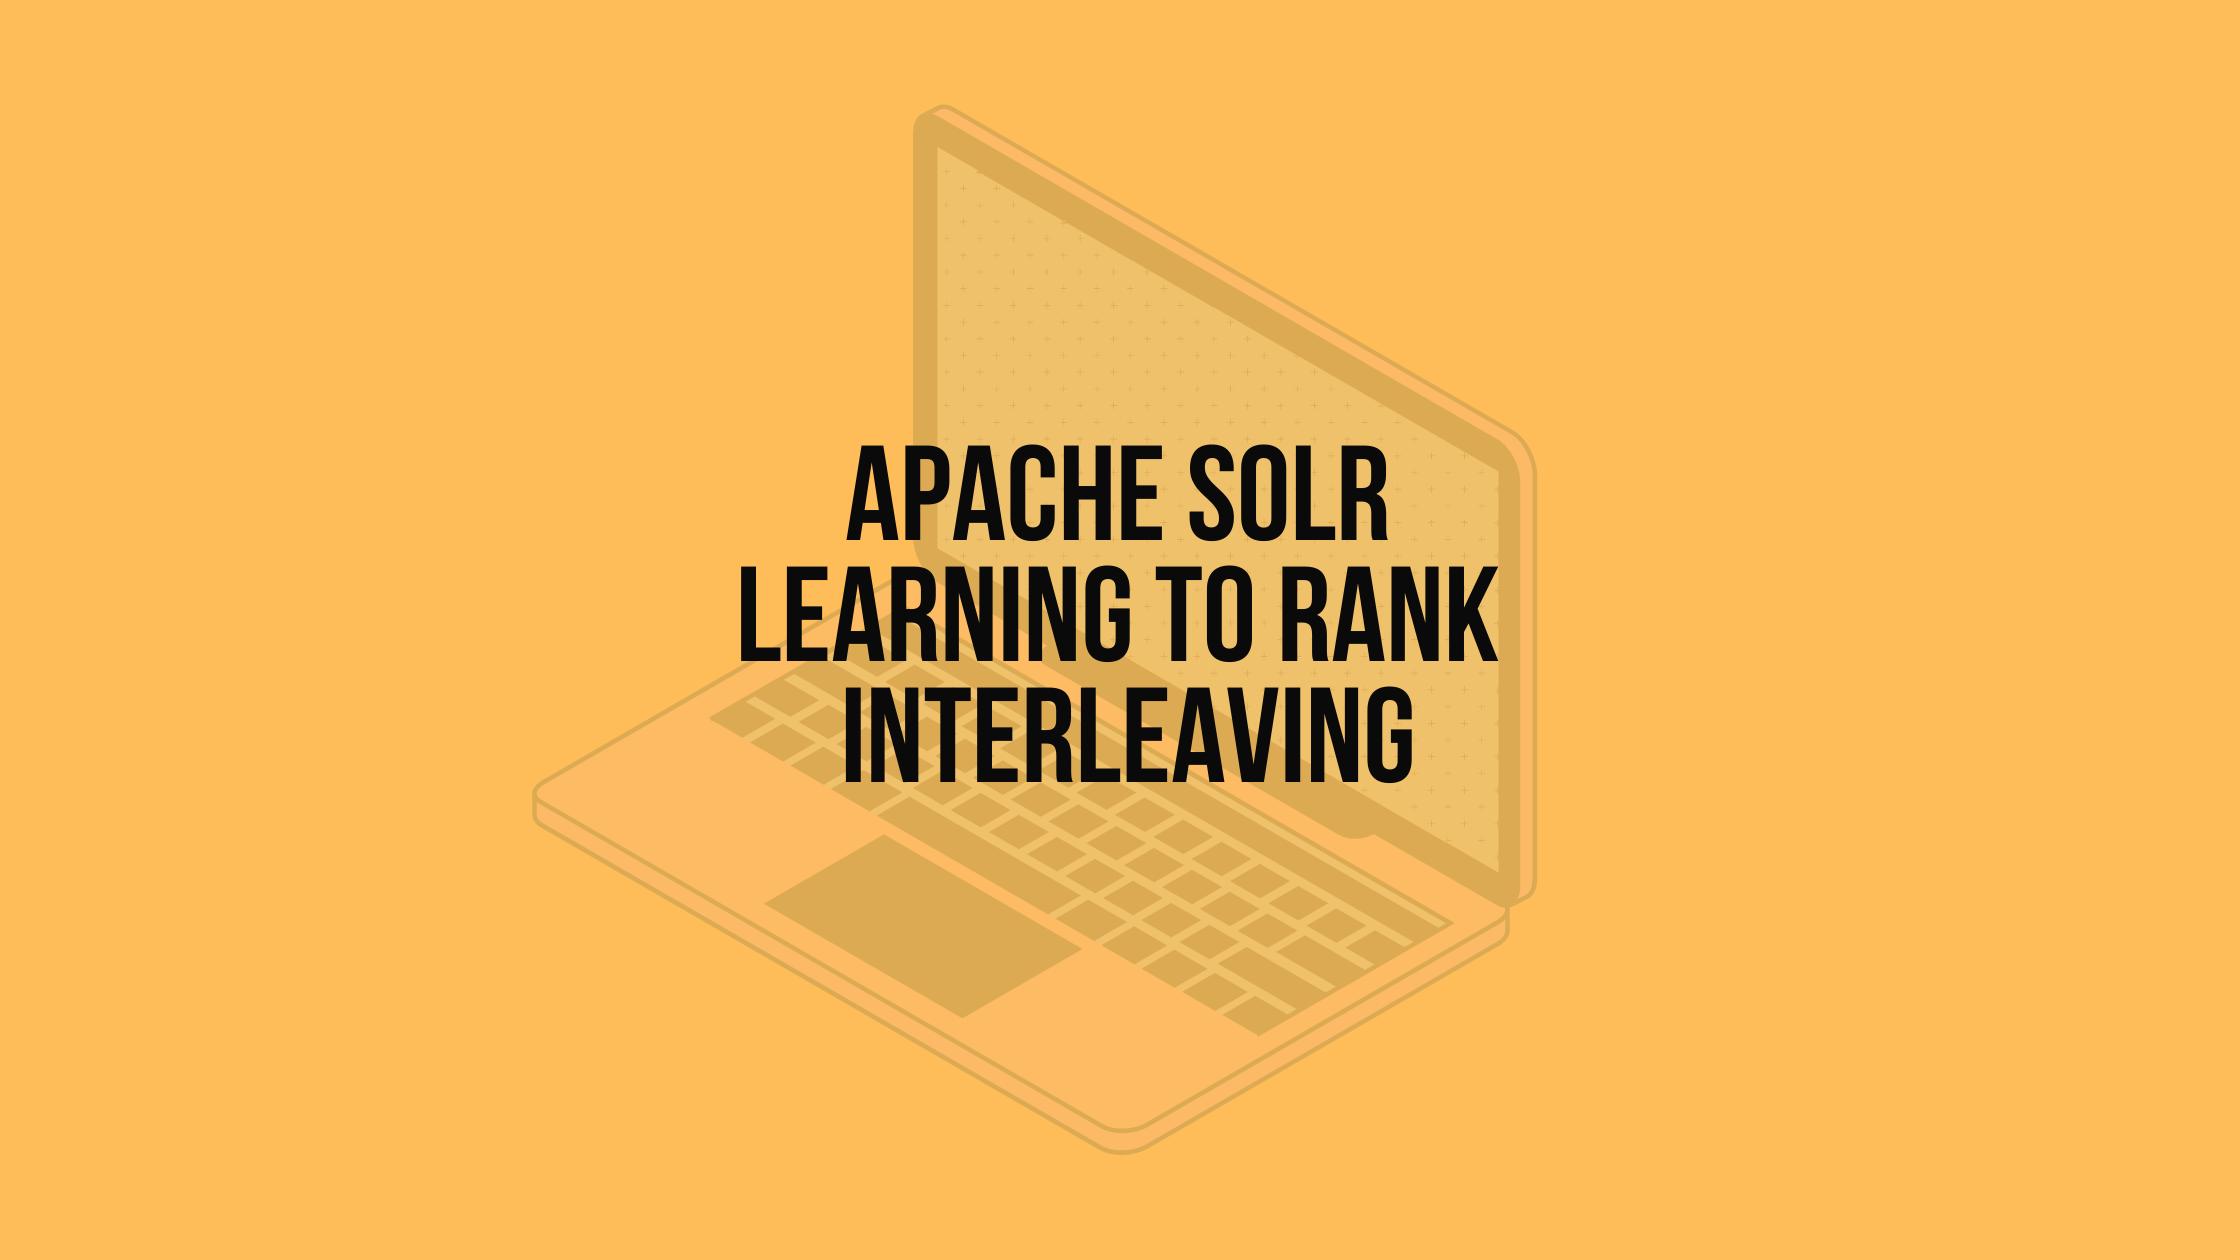 Apache Solr Learning To Rank Interleaving